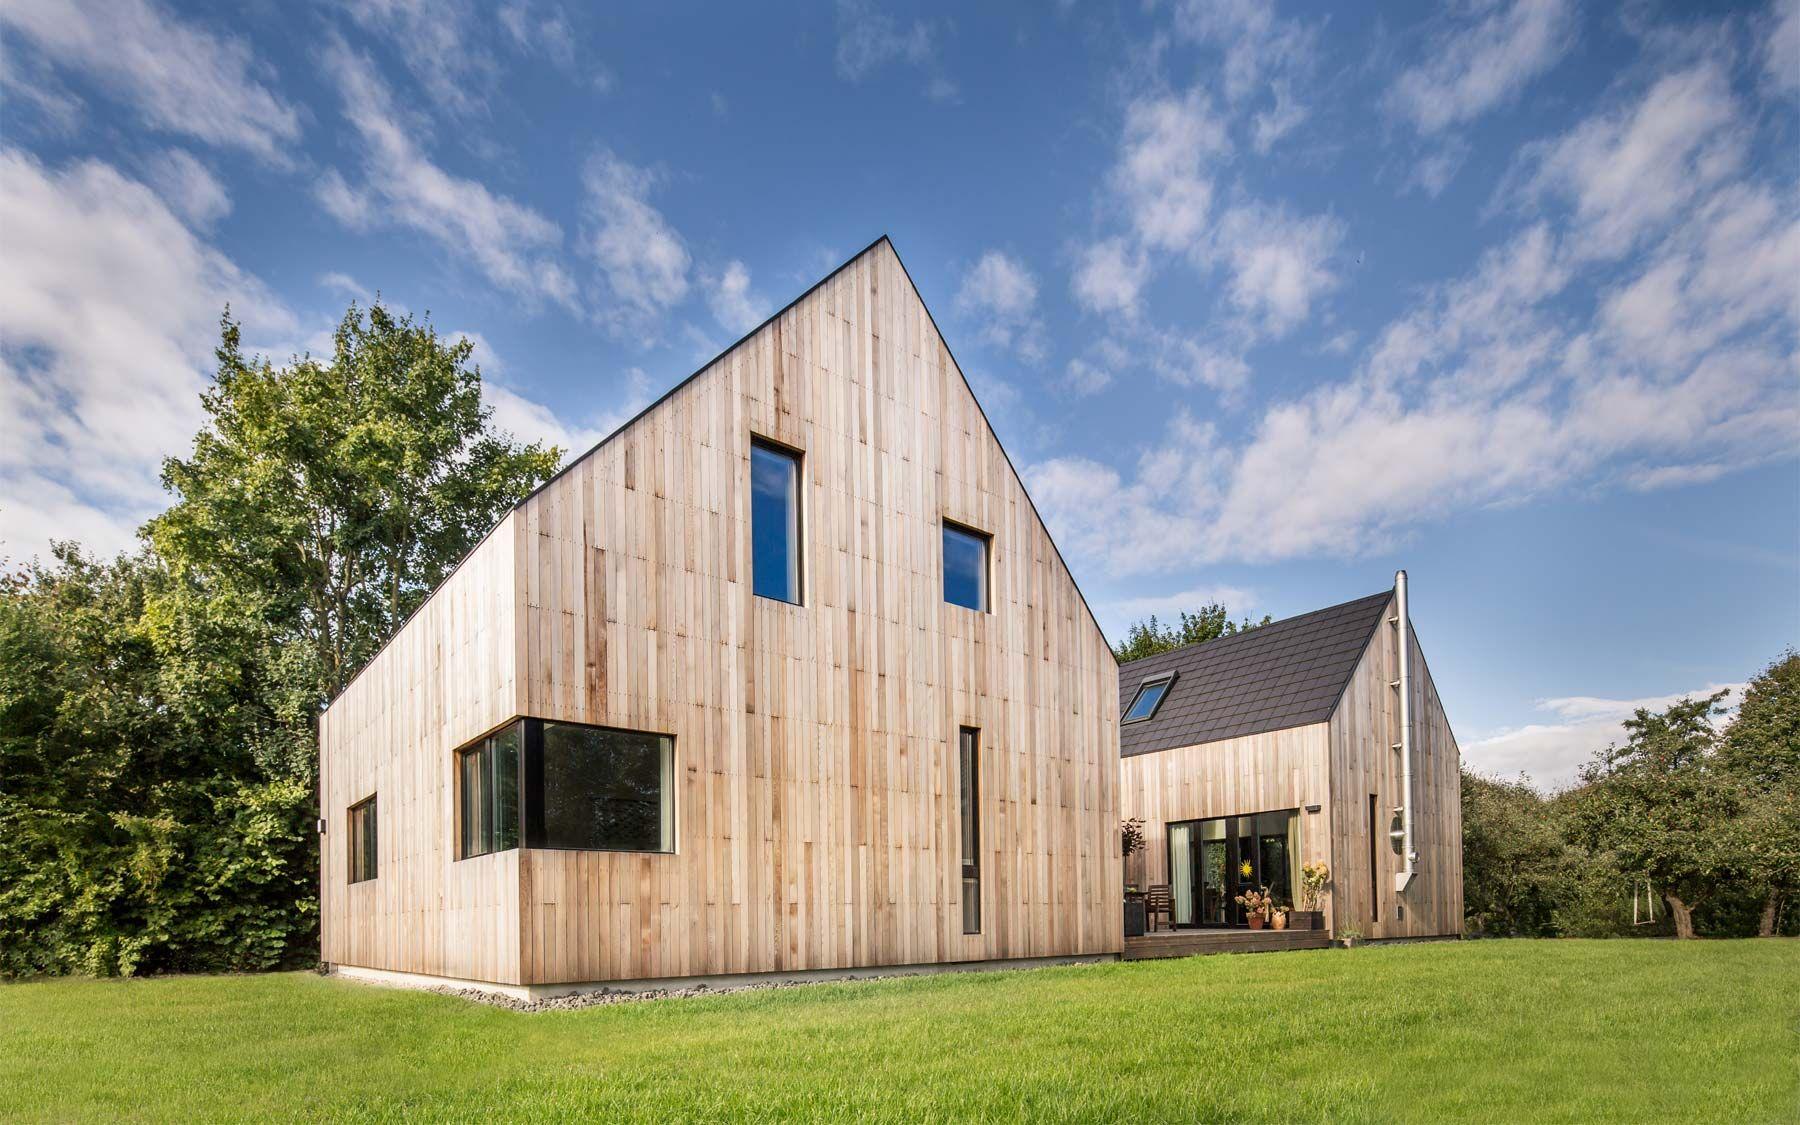 Christian Stolz haus autzen christian stolz house archi design